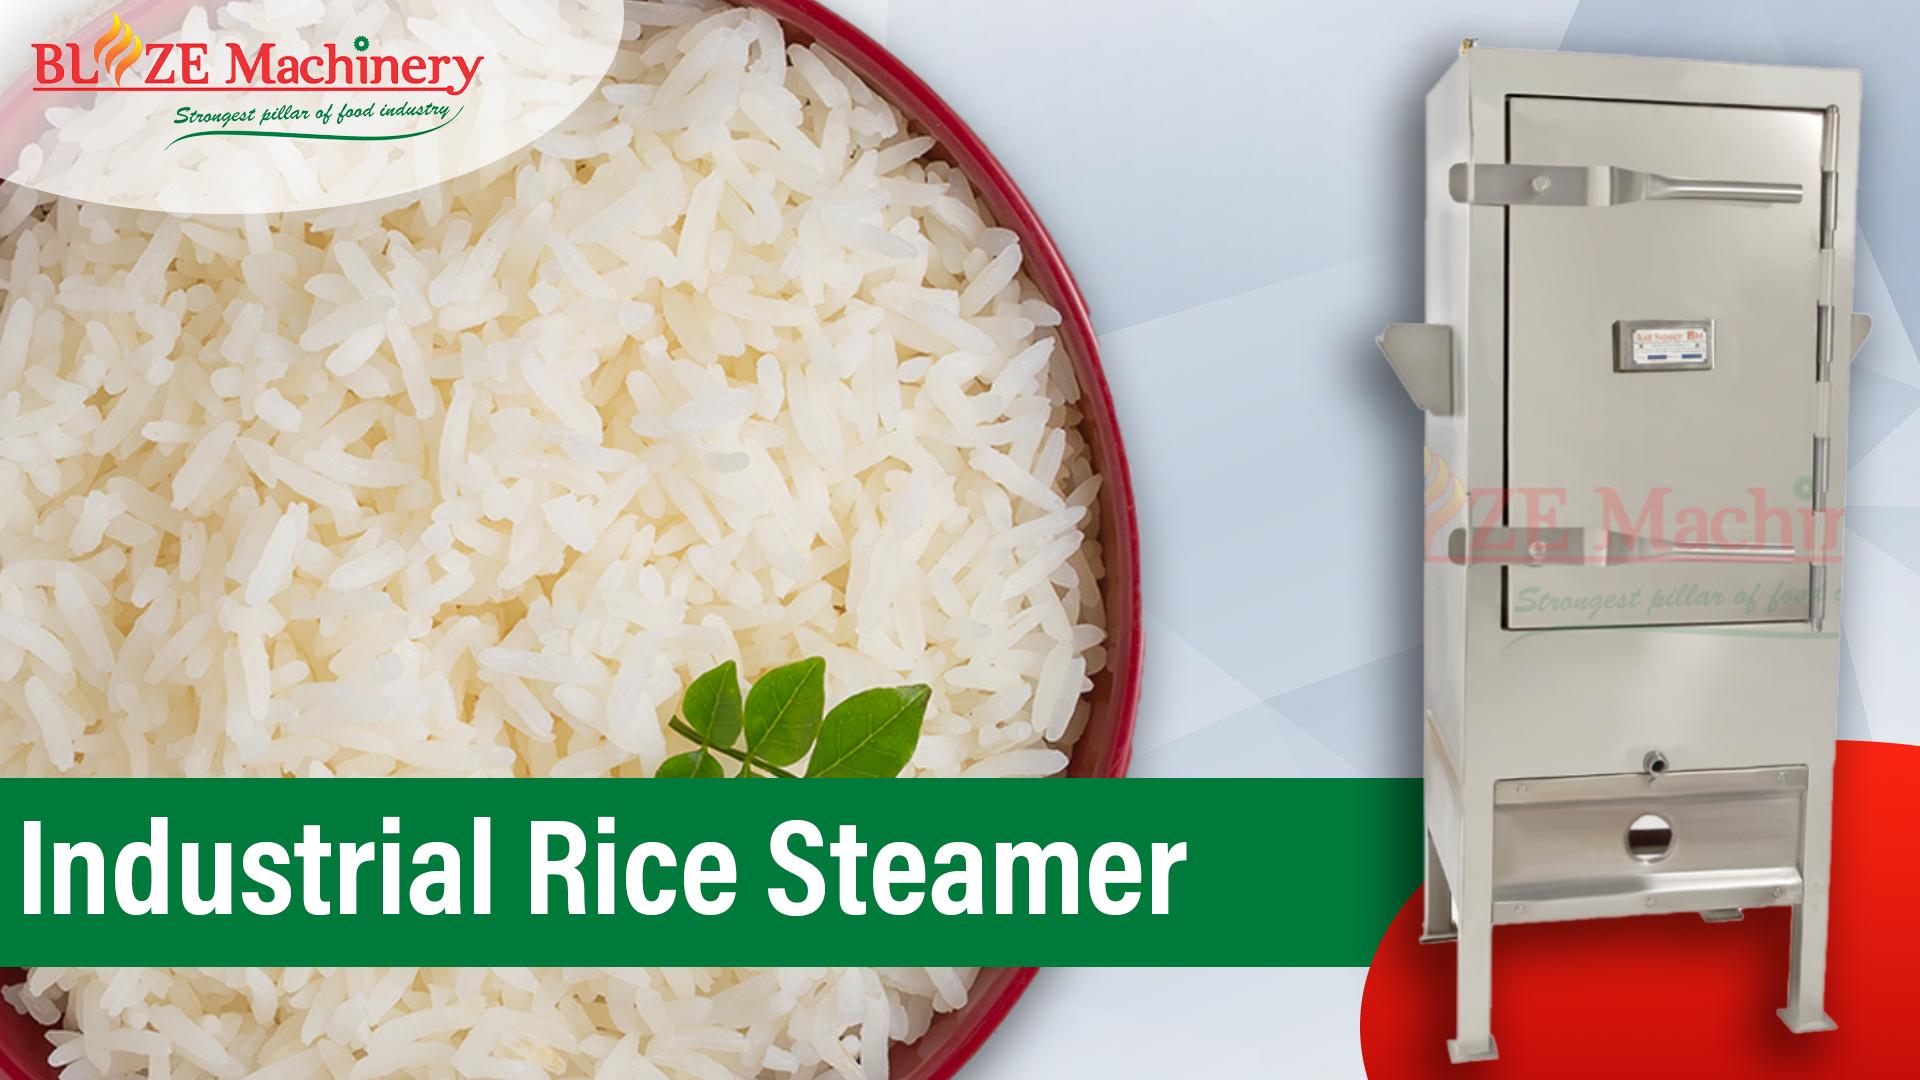 Industrial Rice Steamer